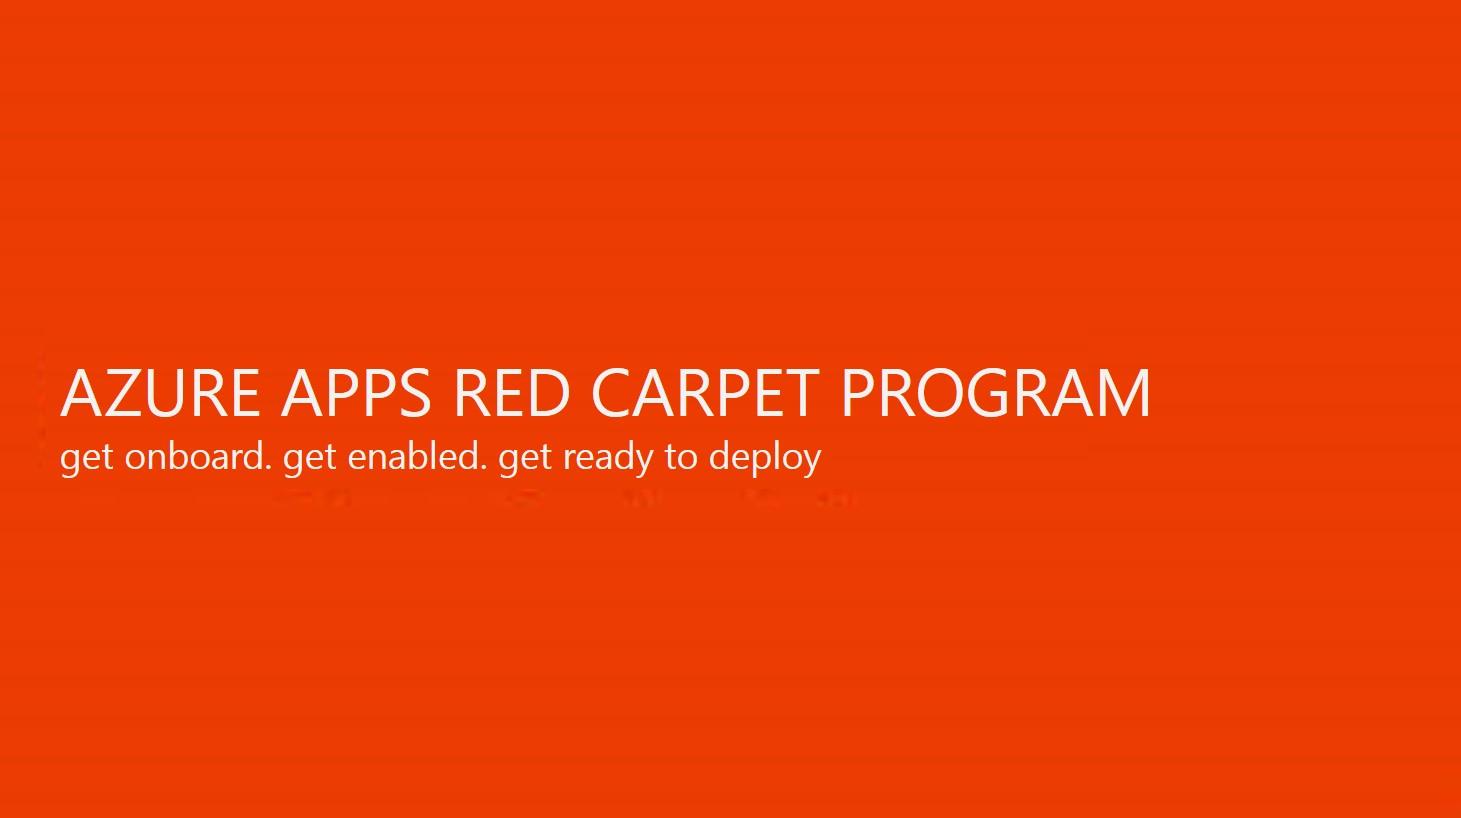 microsoft red carpet